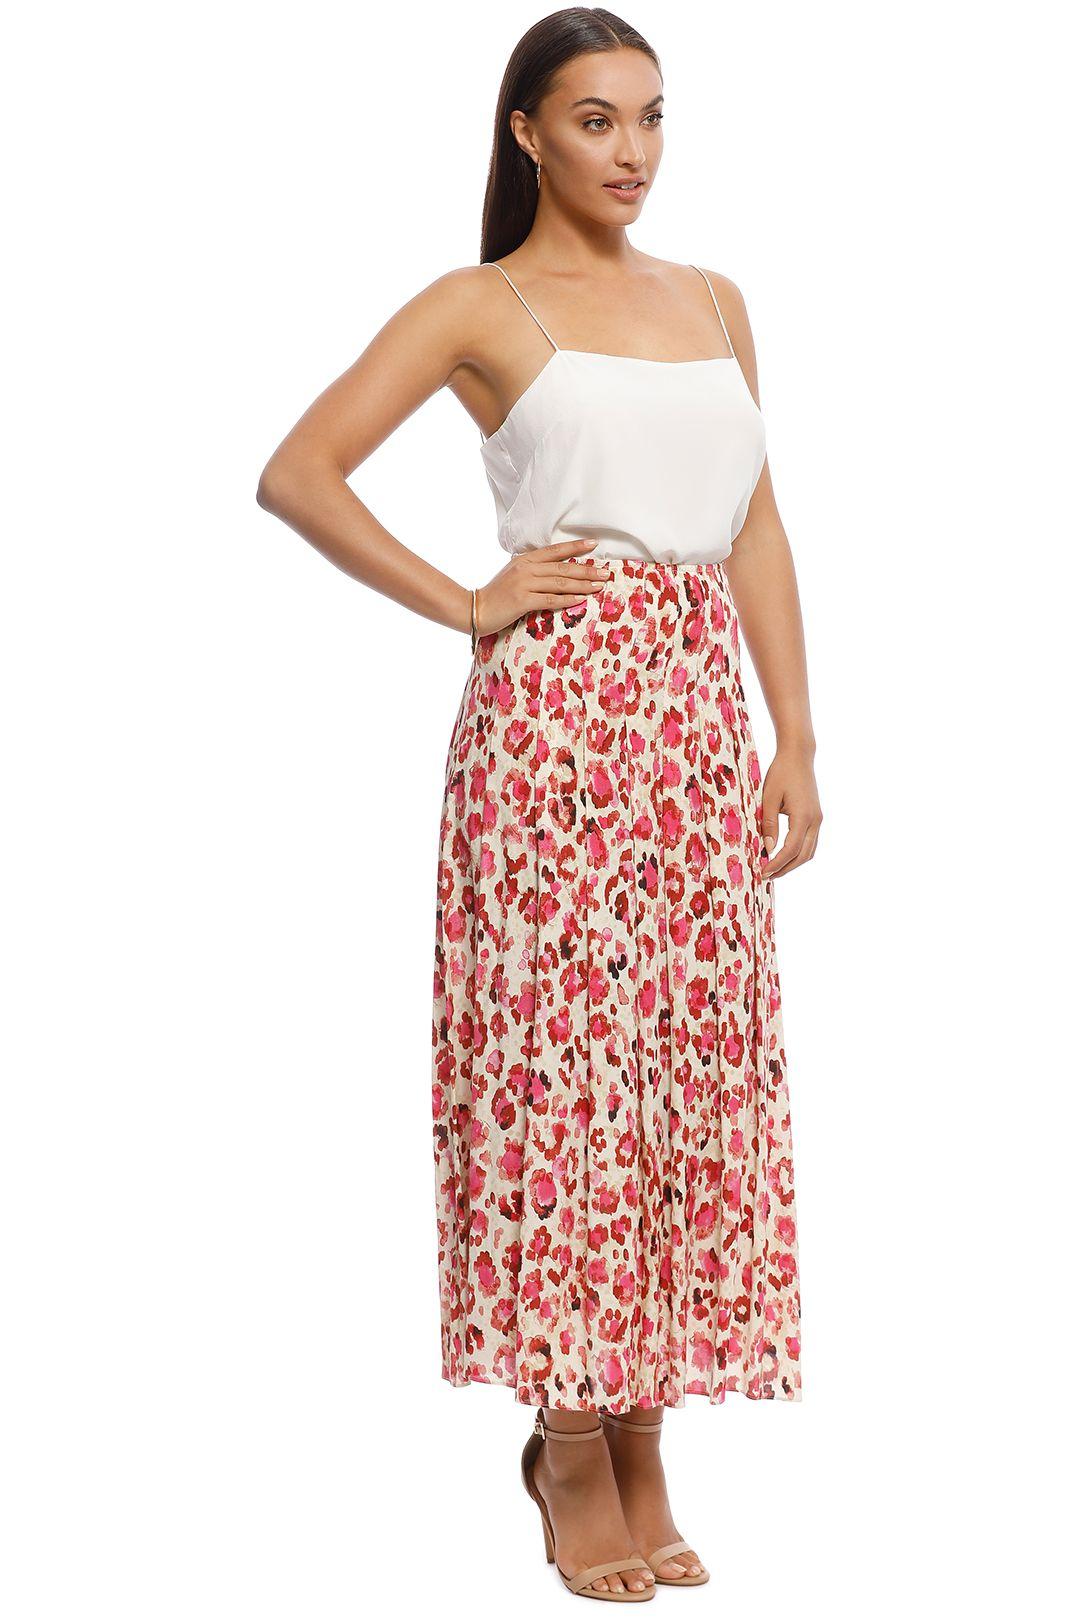 MNG - Elea Printed Midi Skirt - Pink - Side